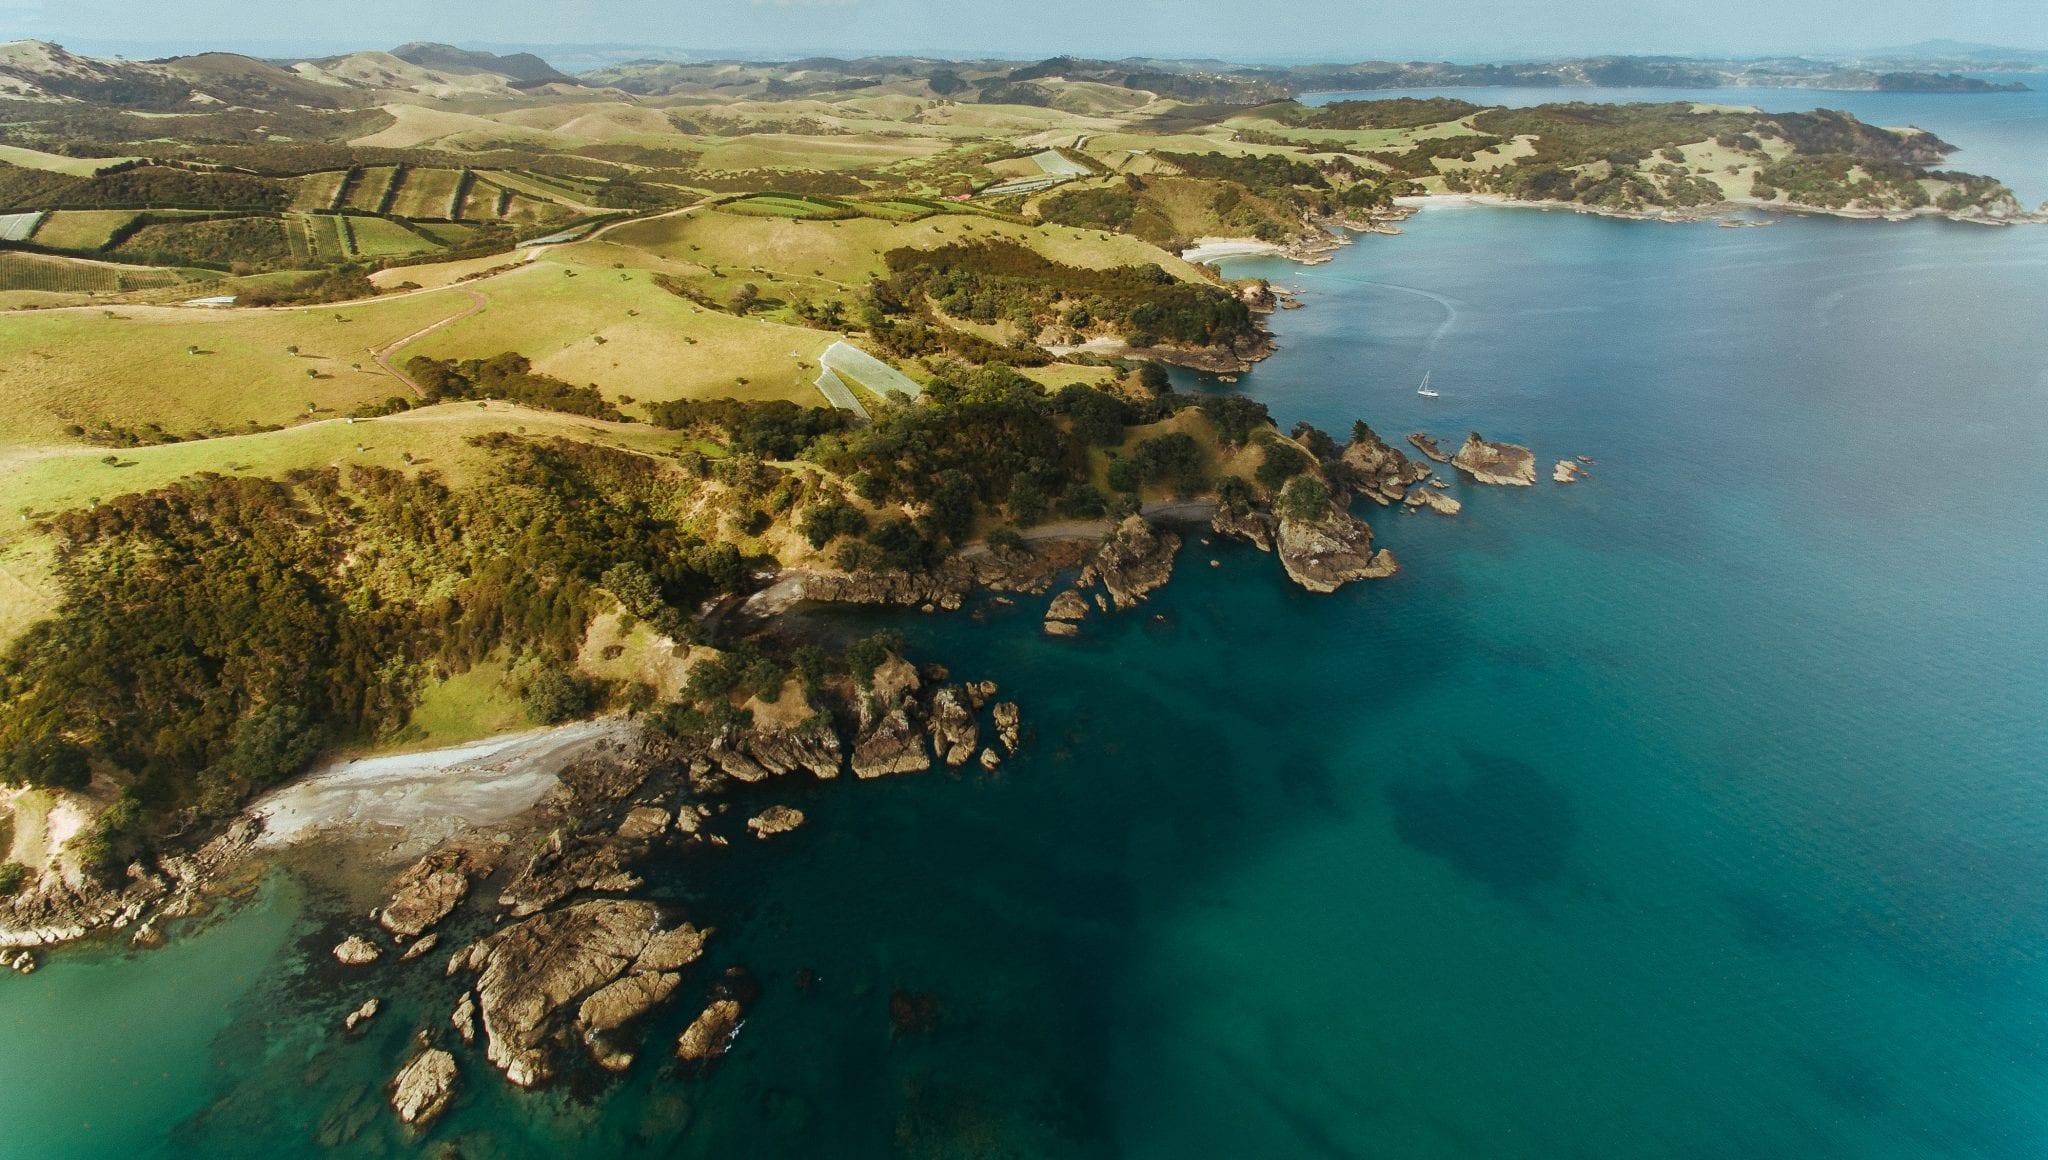 the coast of waiheke island captured by drone